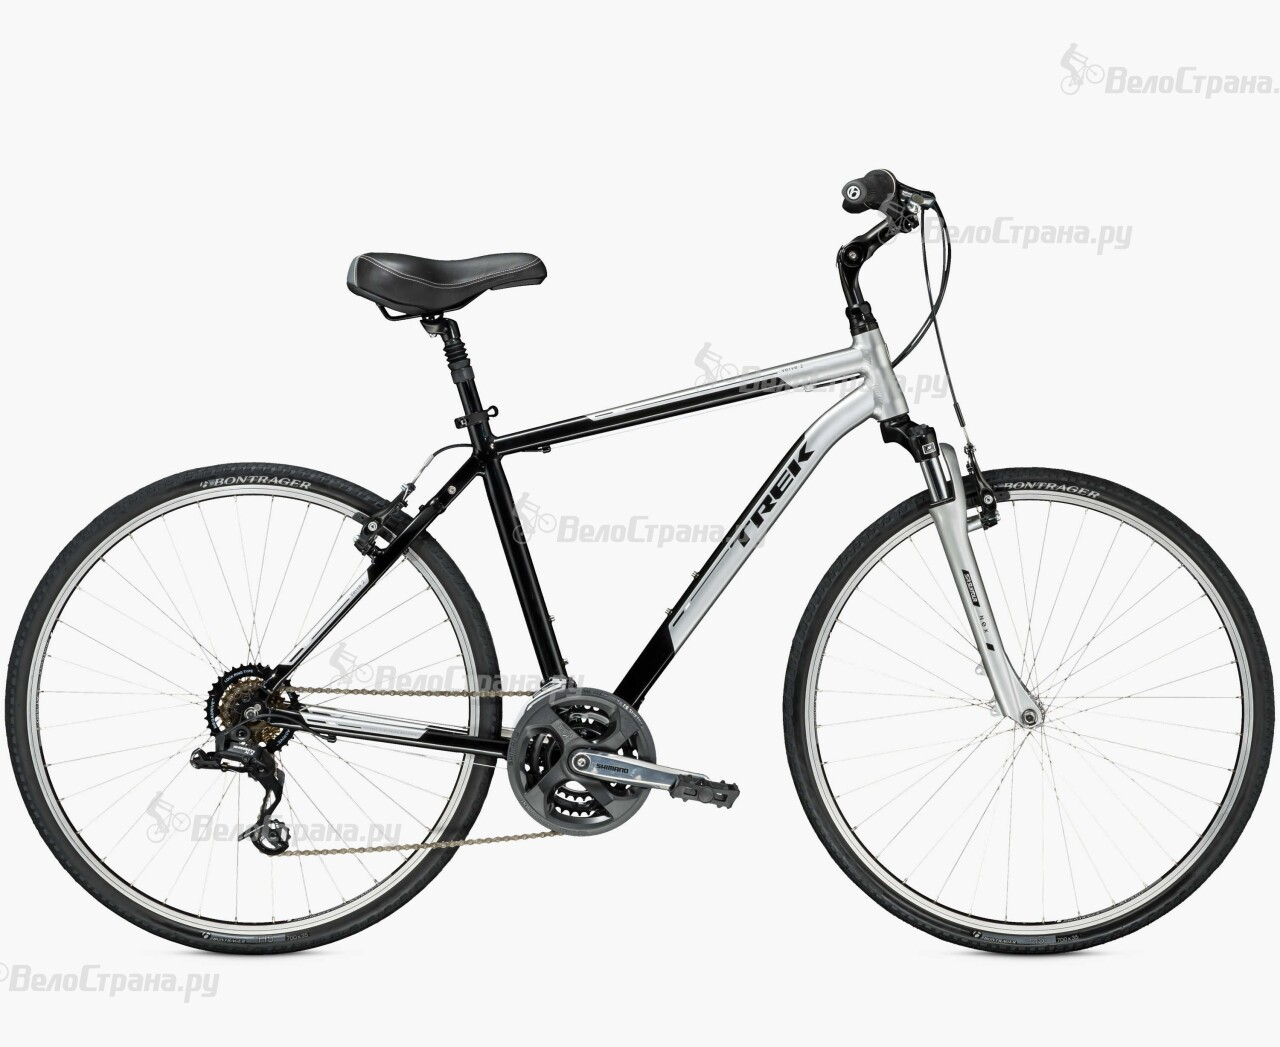 Велосипед Trek Verve 2 (2016) велосипед trek verve 2 2014